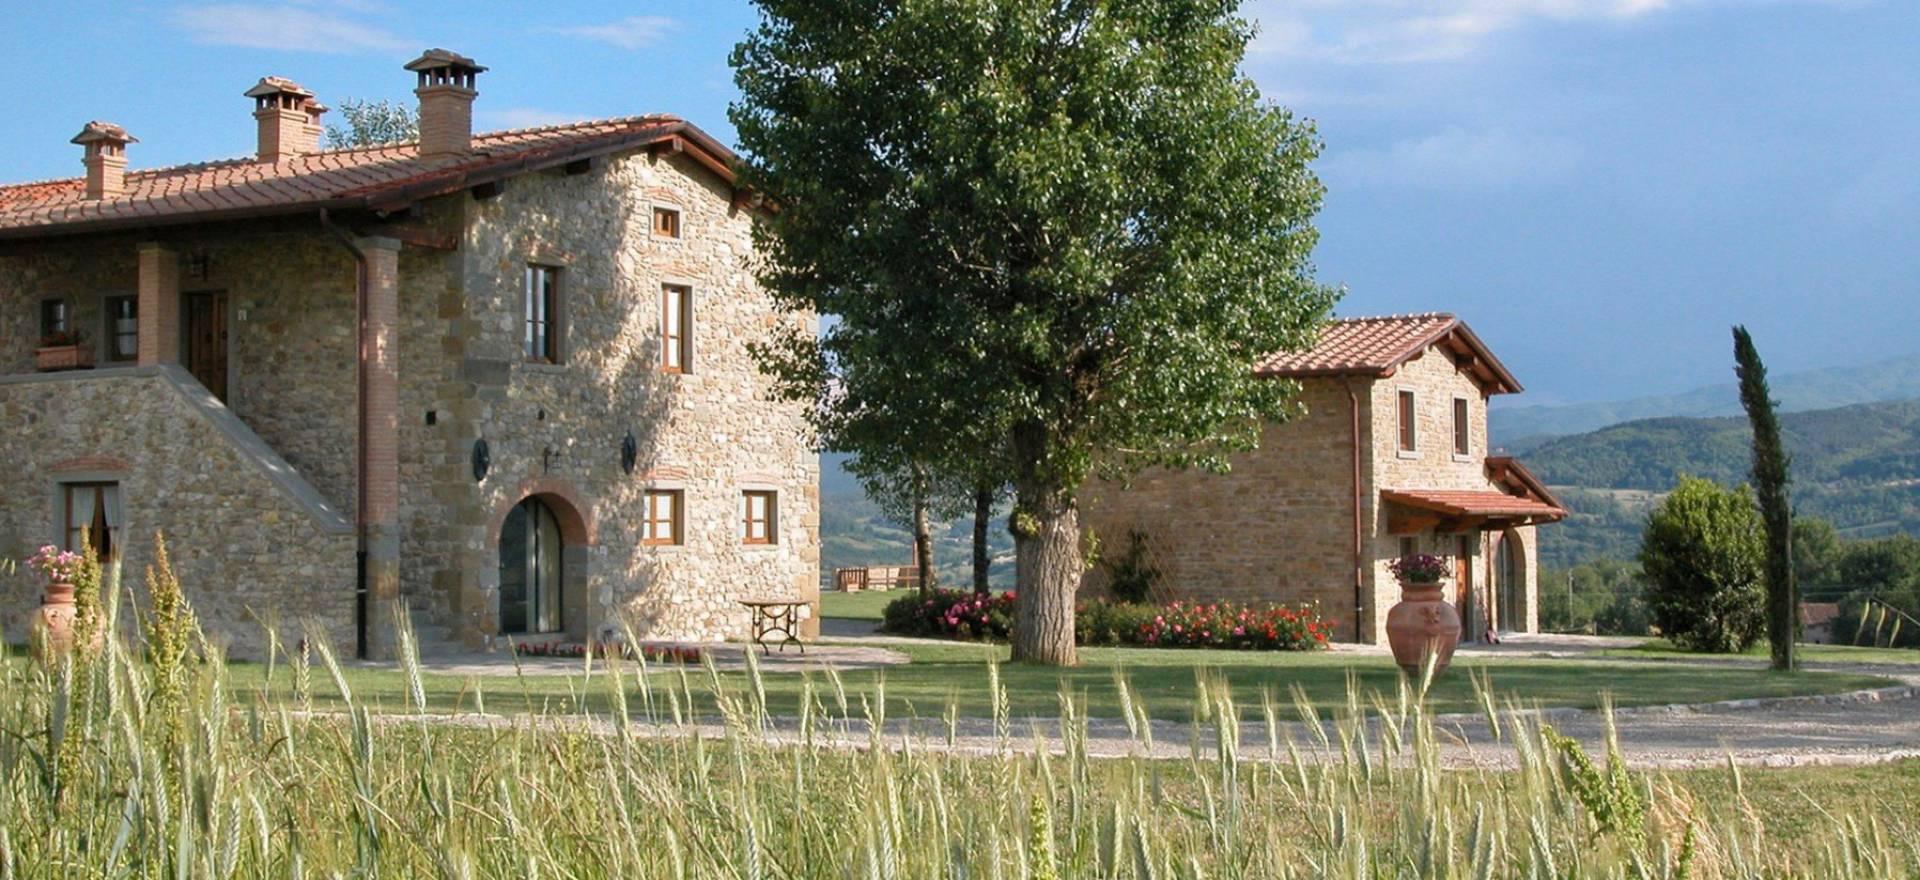 Agriturismo Toscana Bellissimo agriturismo in Toscana con vista incredibile!